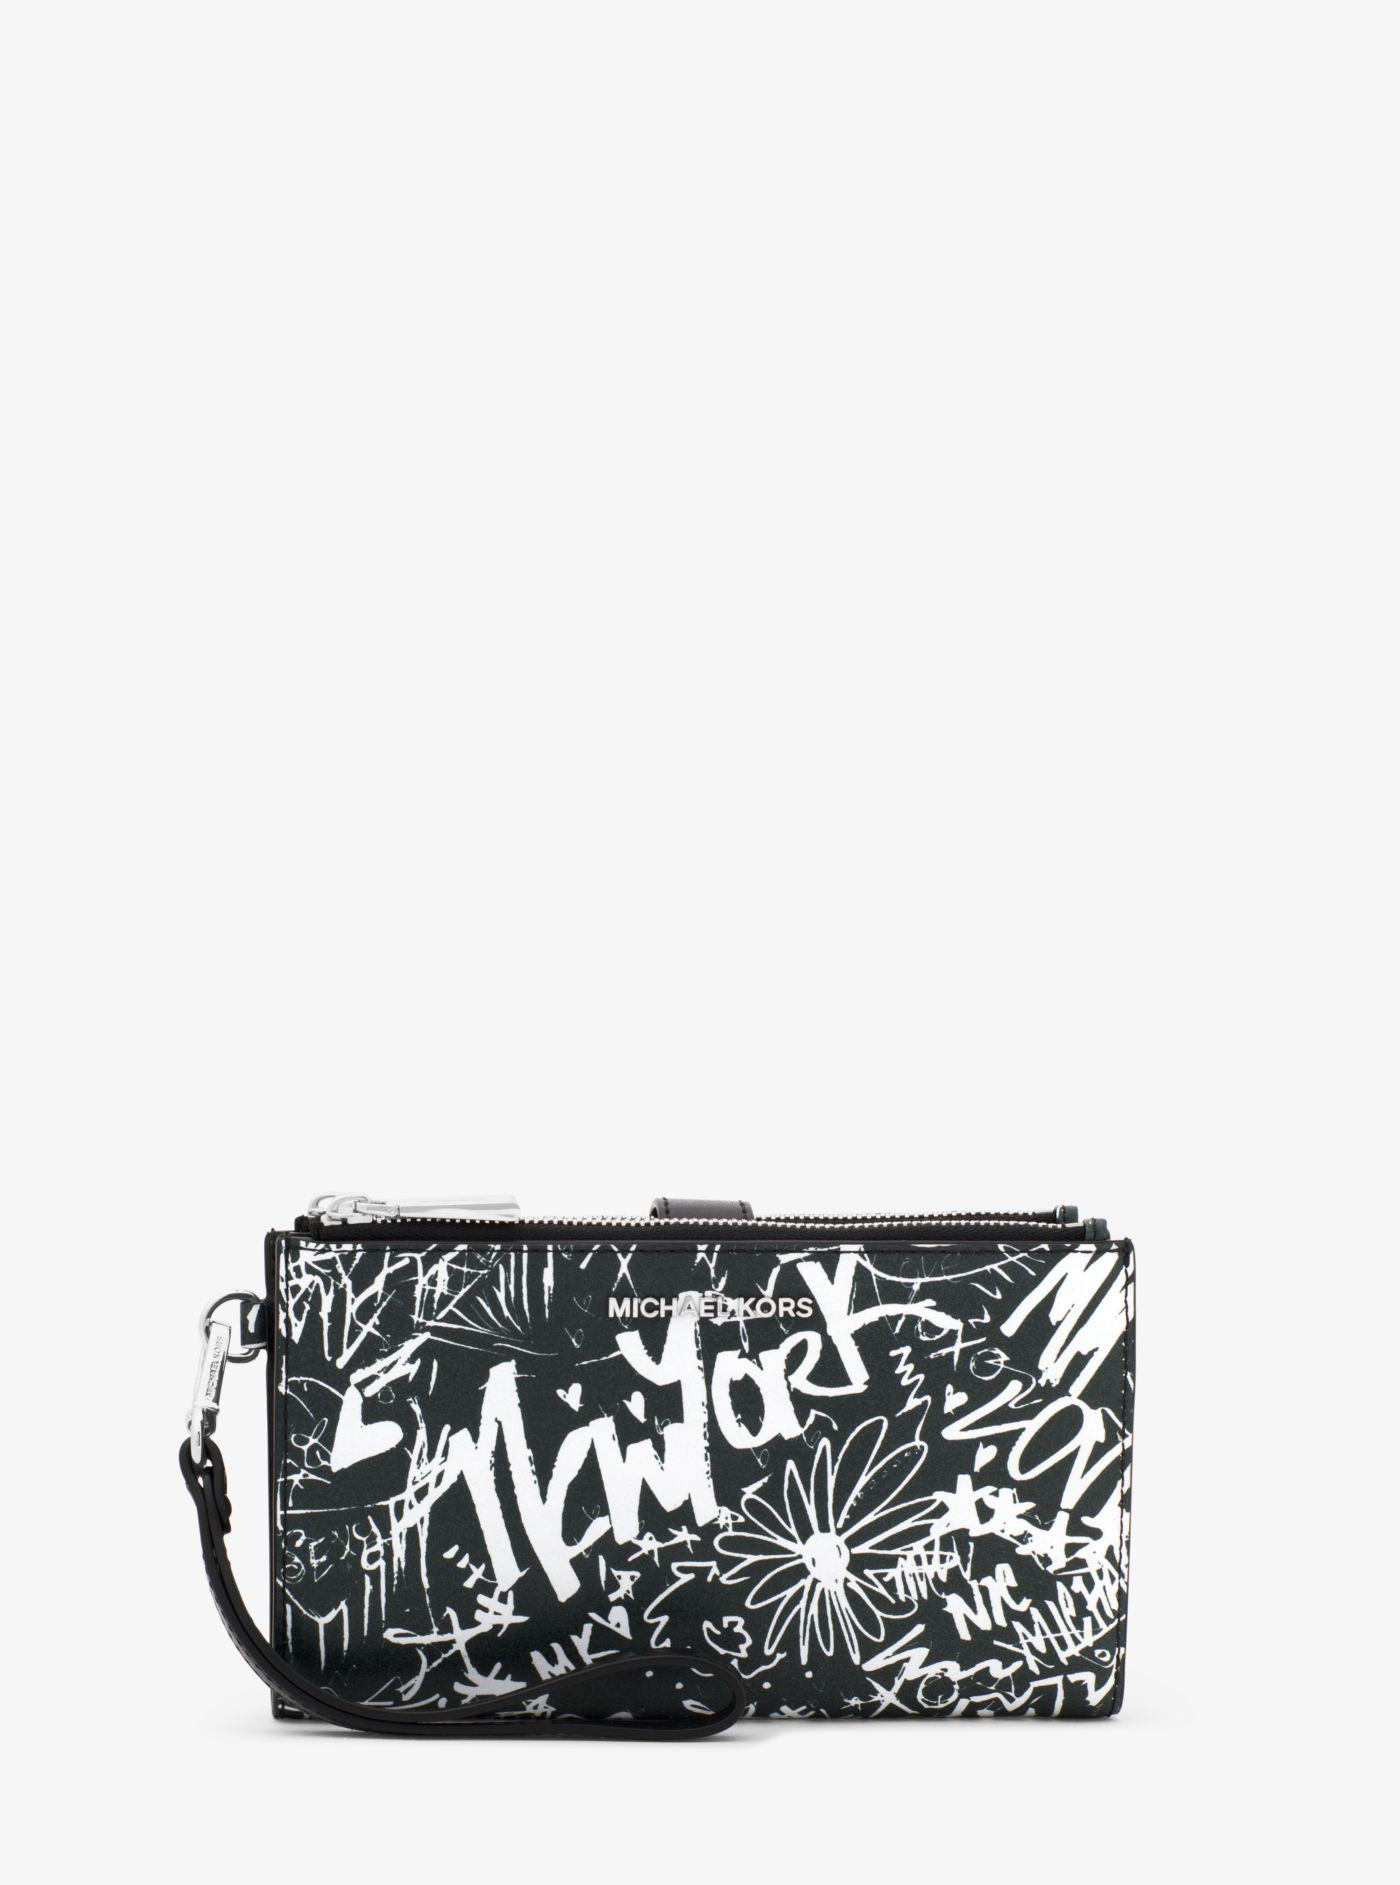 260018bf5843 discount code for michael kors black adele graffiti leather smartphone  wallet lyst. view fullscreen 748b2